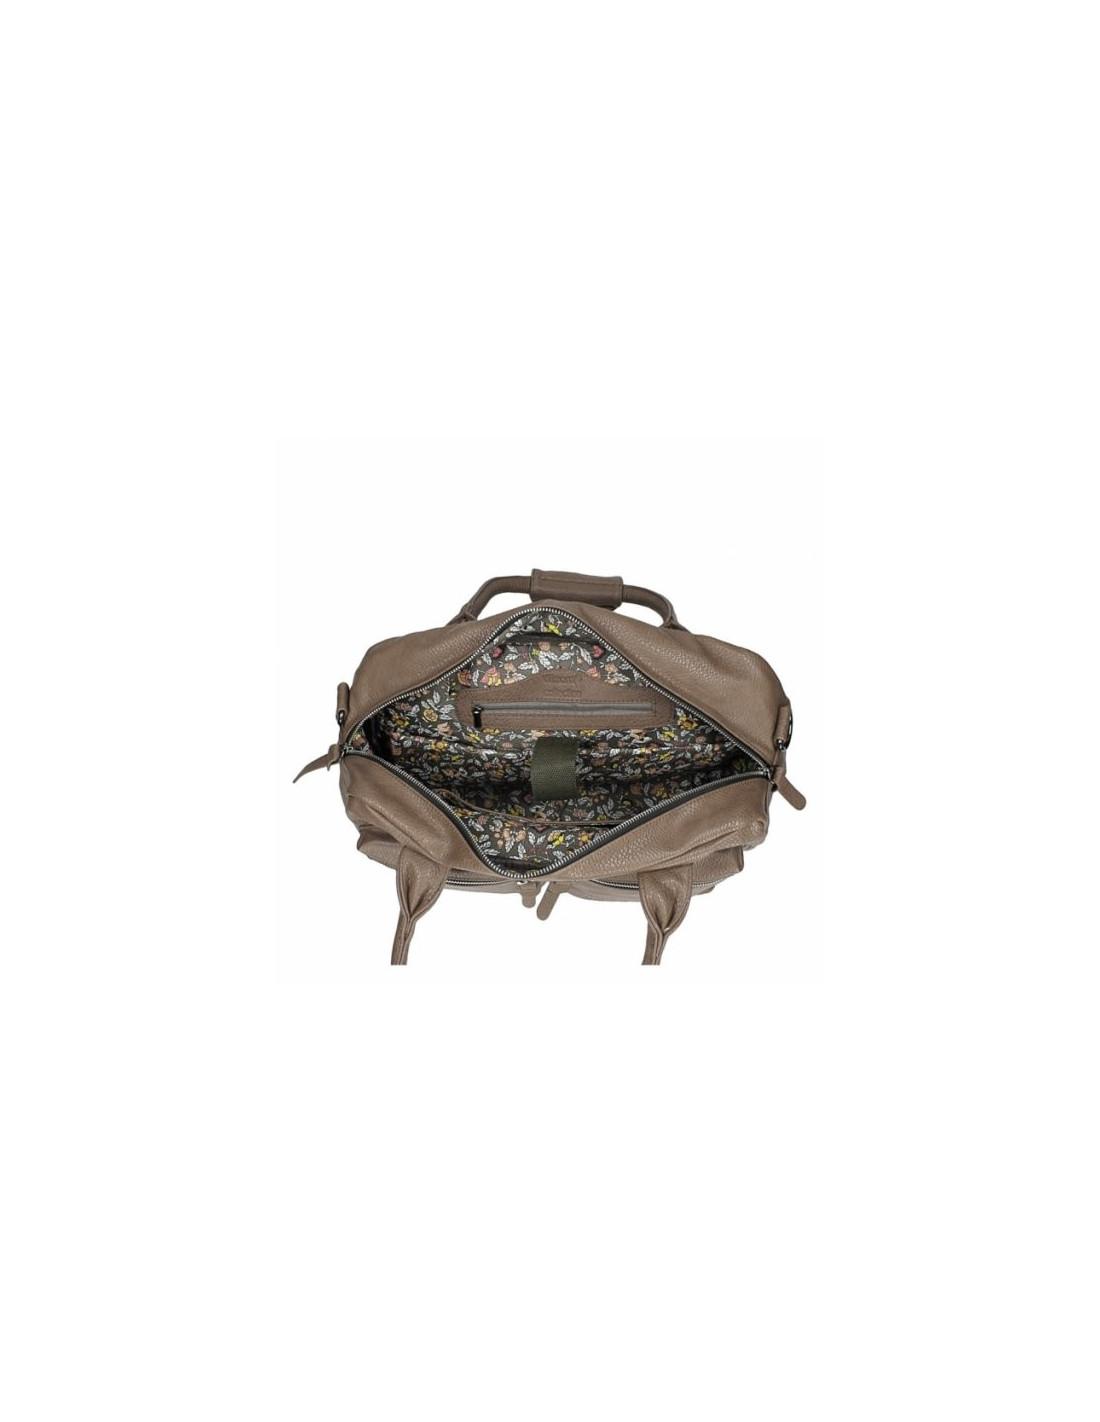 Wimona Schoudertas Donkerblauw : Wimona schoudertas donkerblauw fuchsia koffer